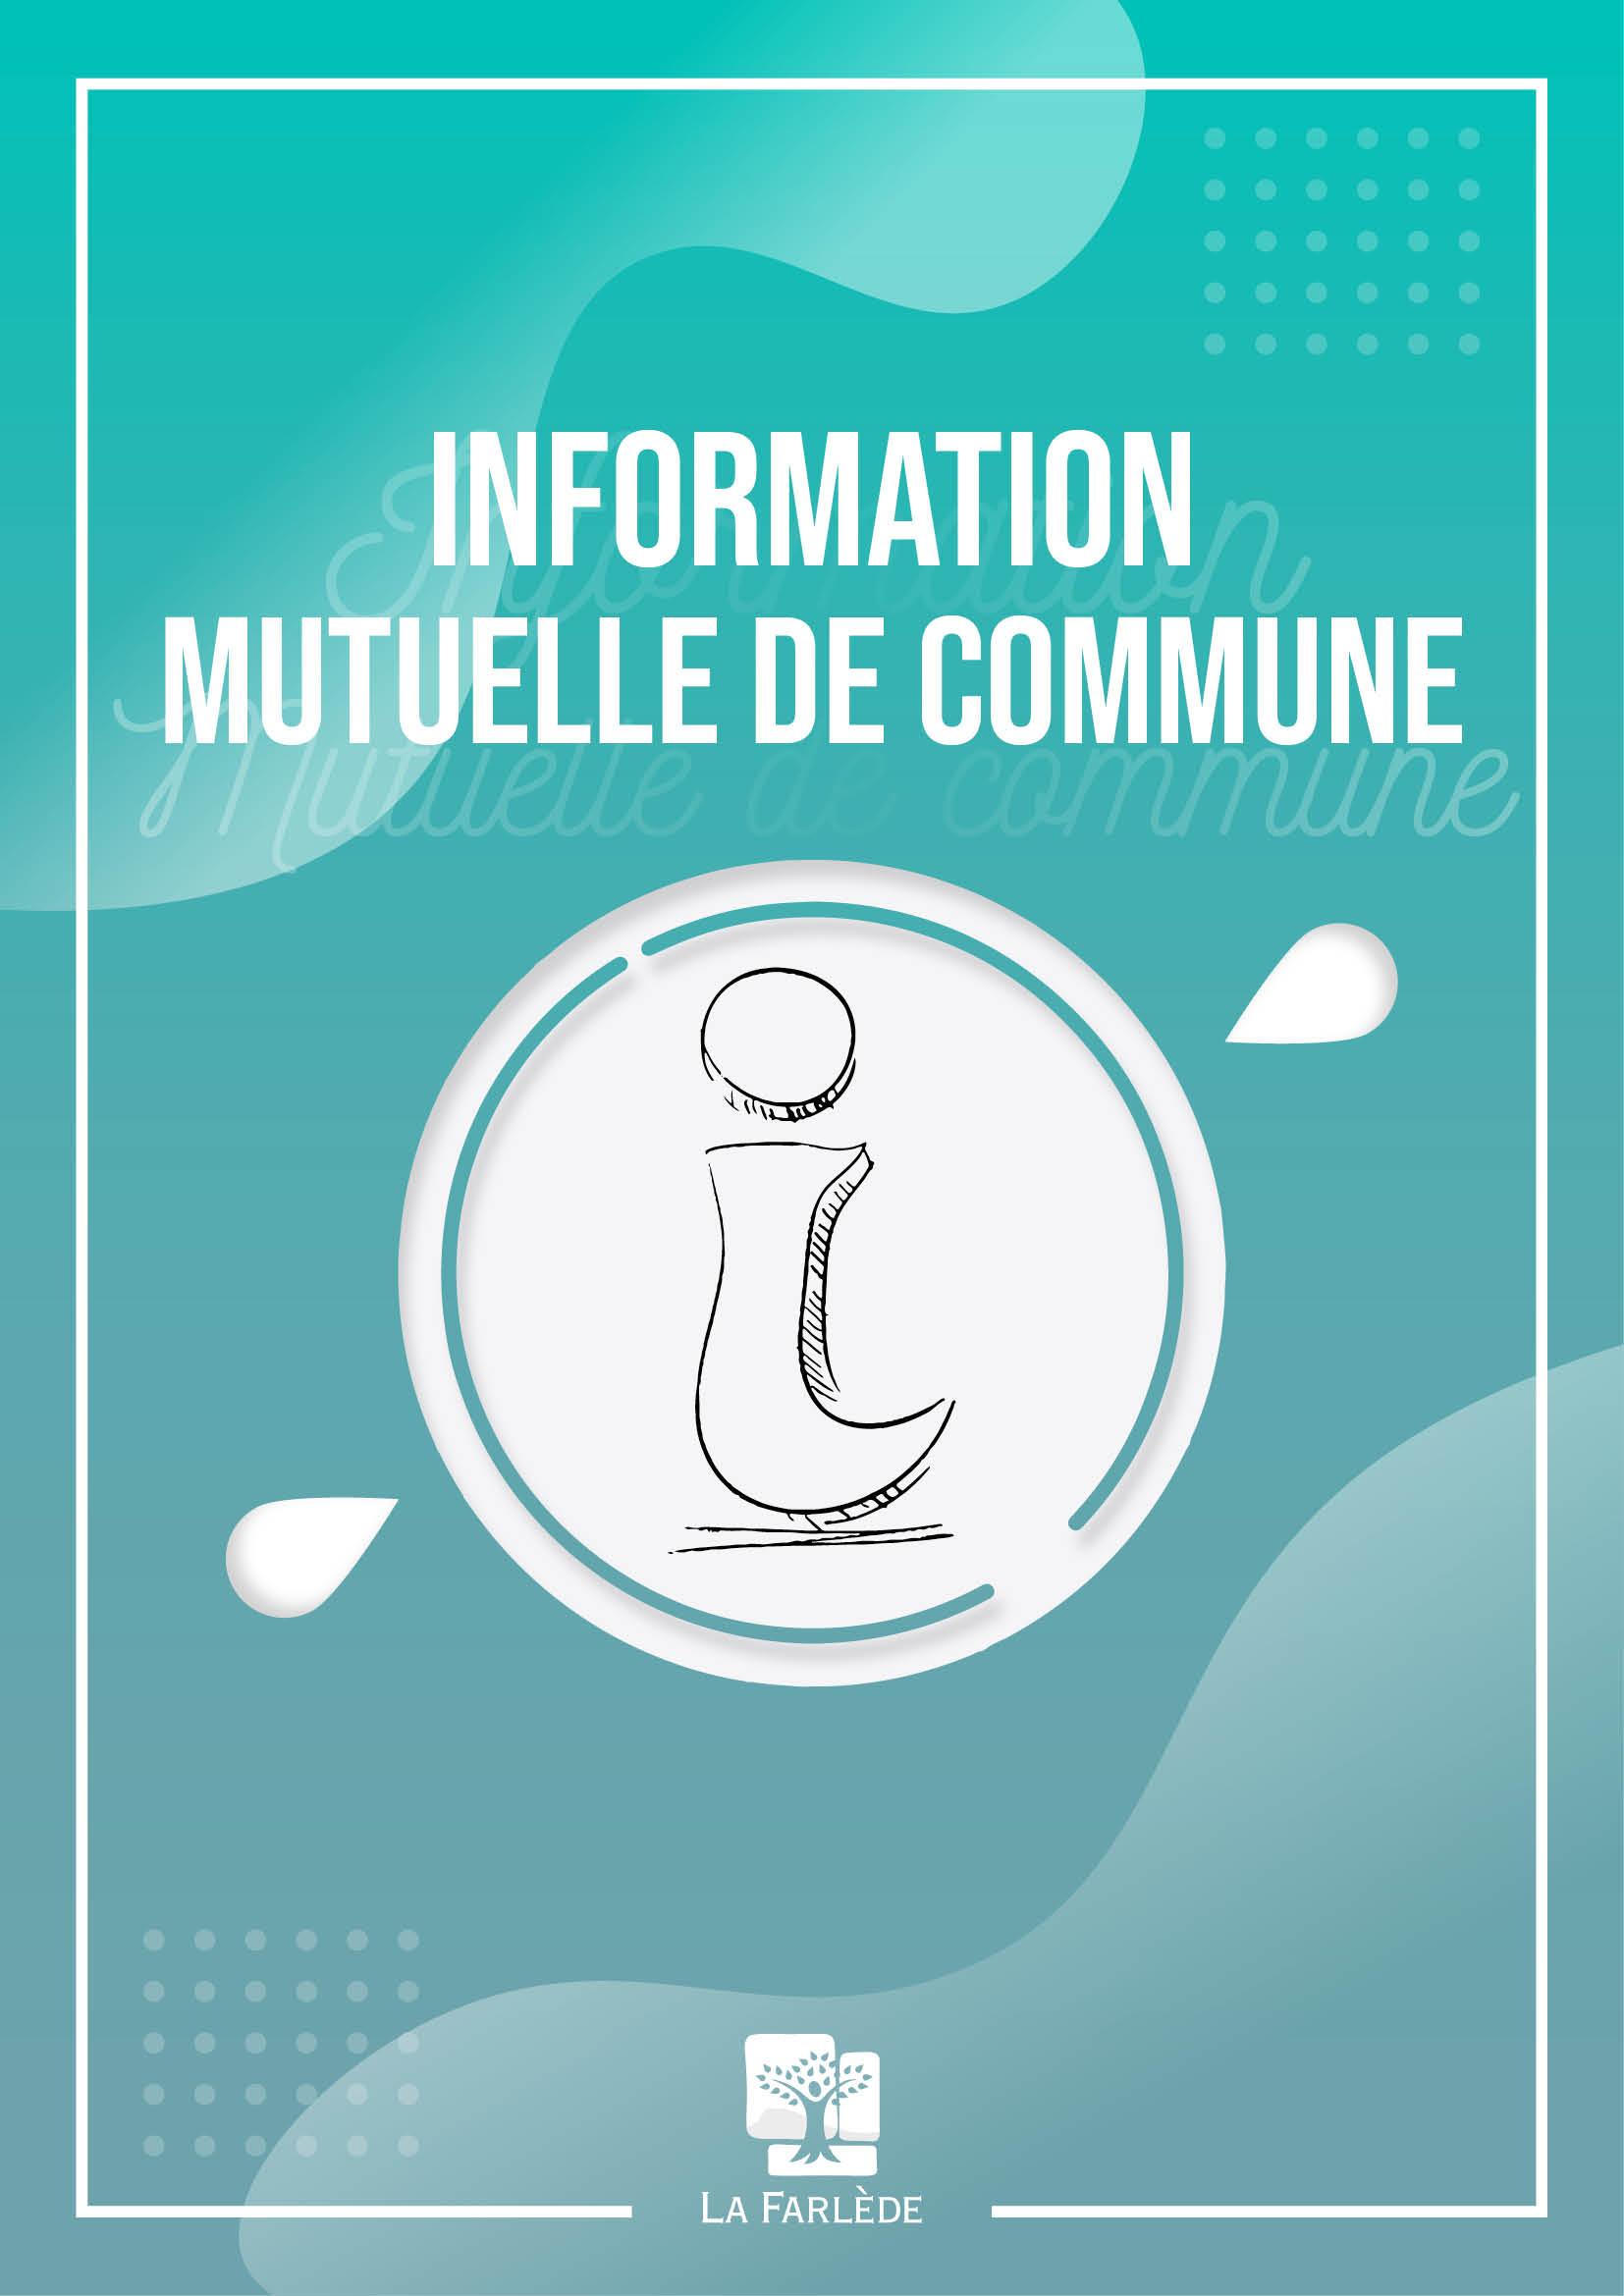 fondvisuelsweb-info_mutuellecommune.jpg